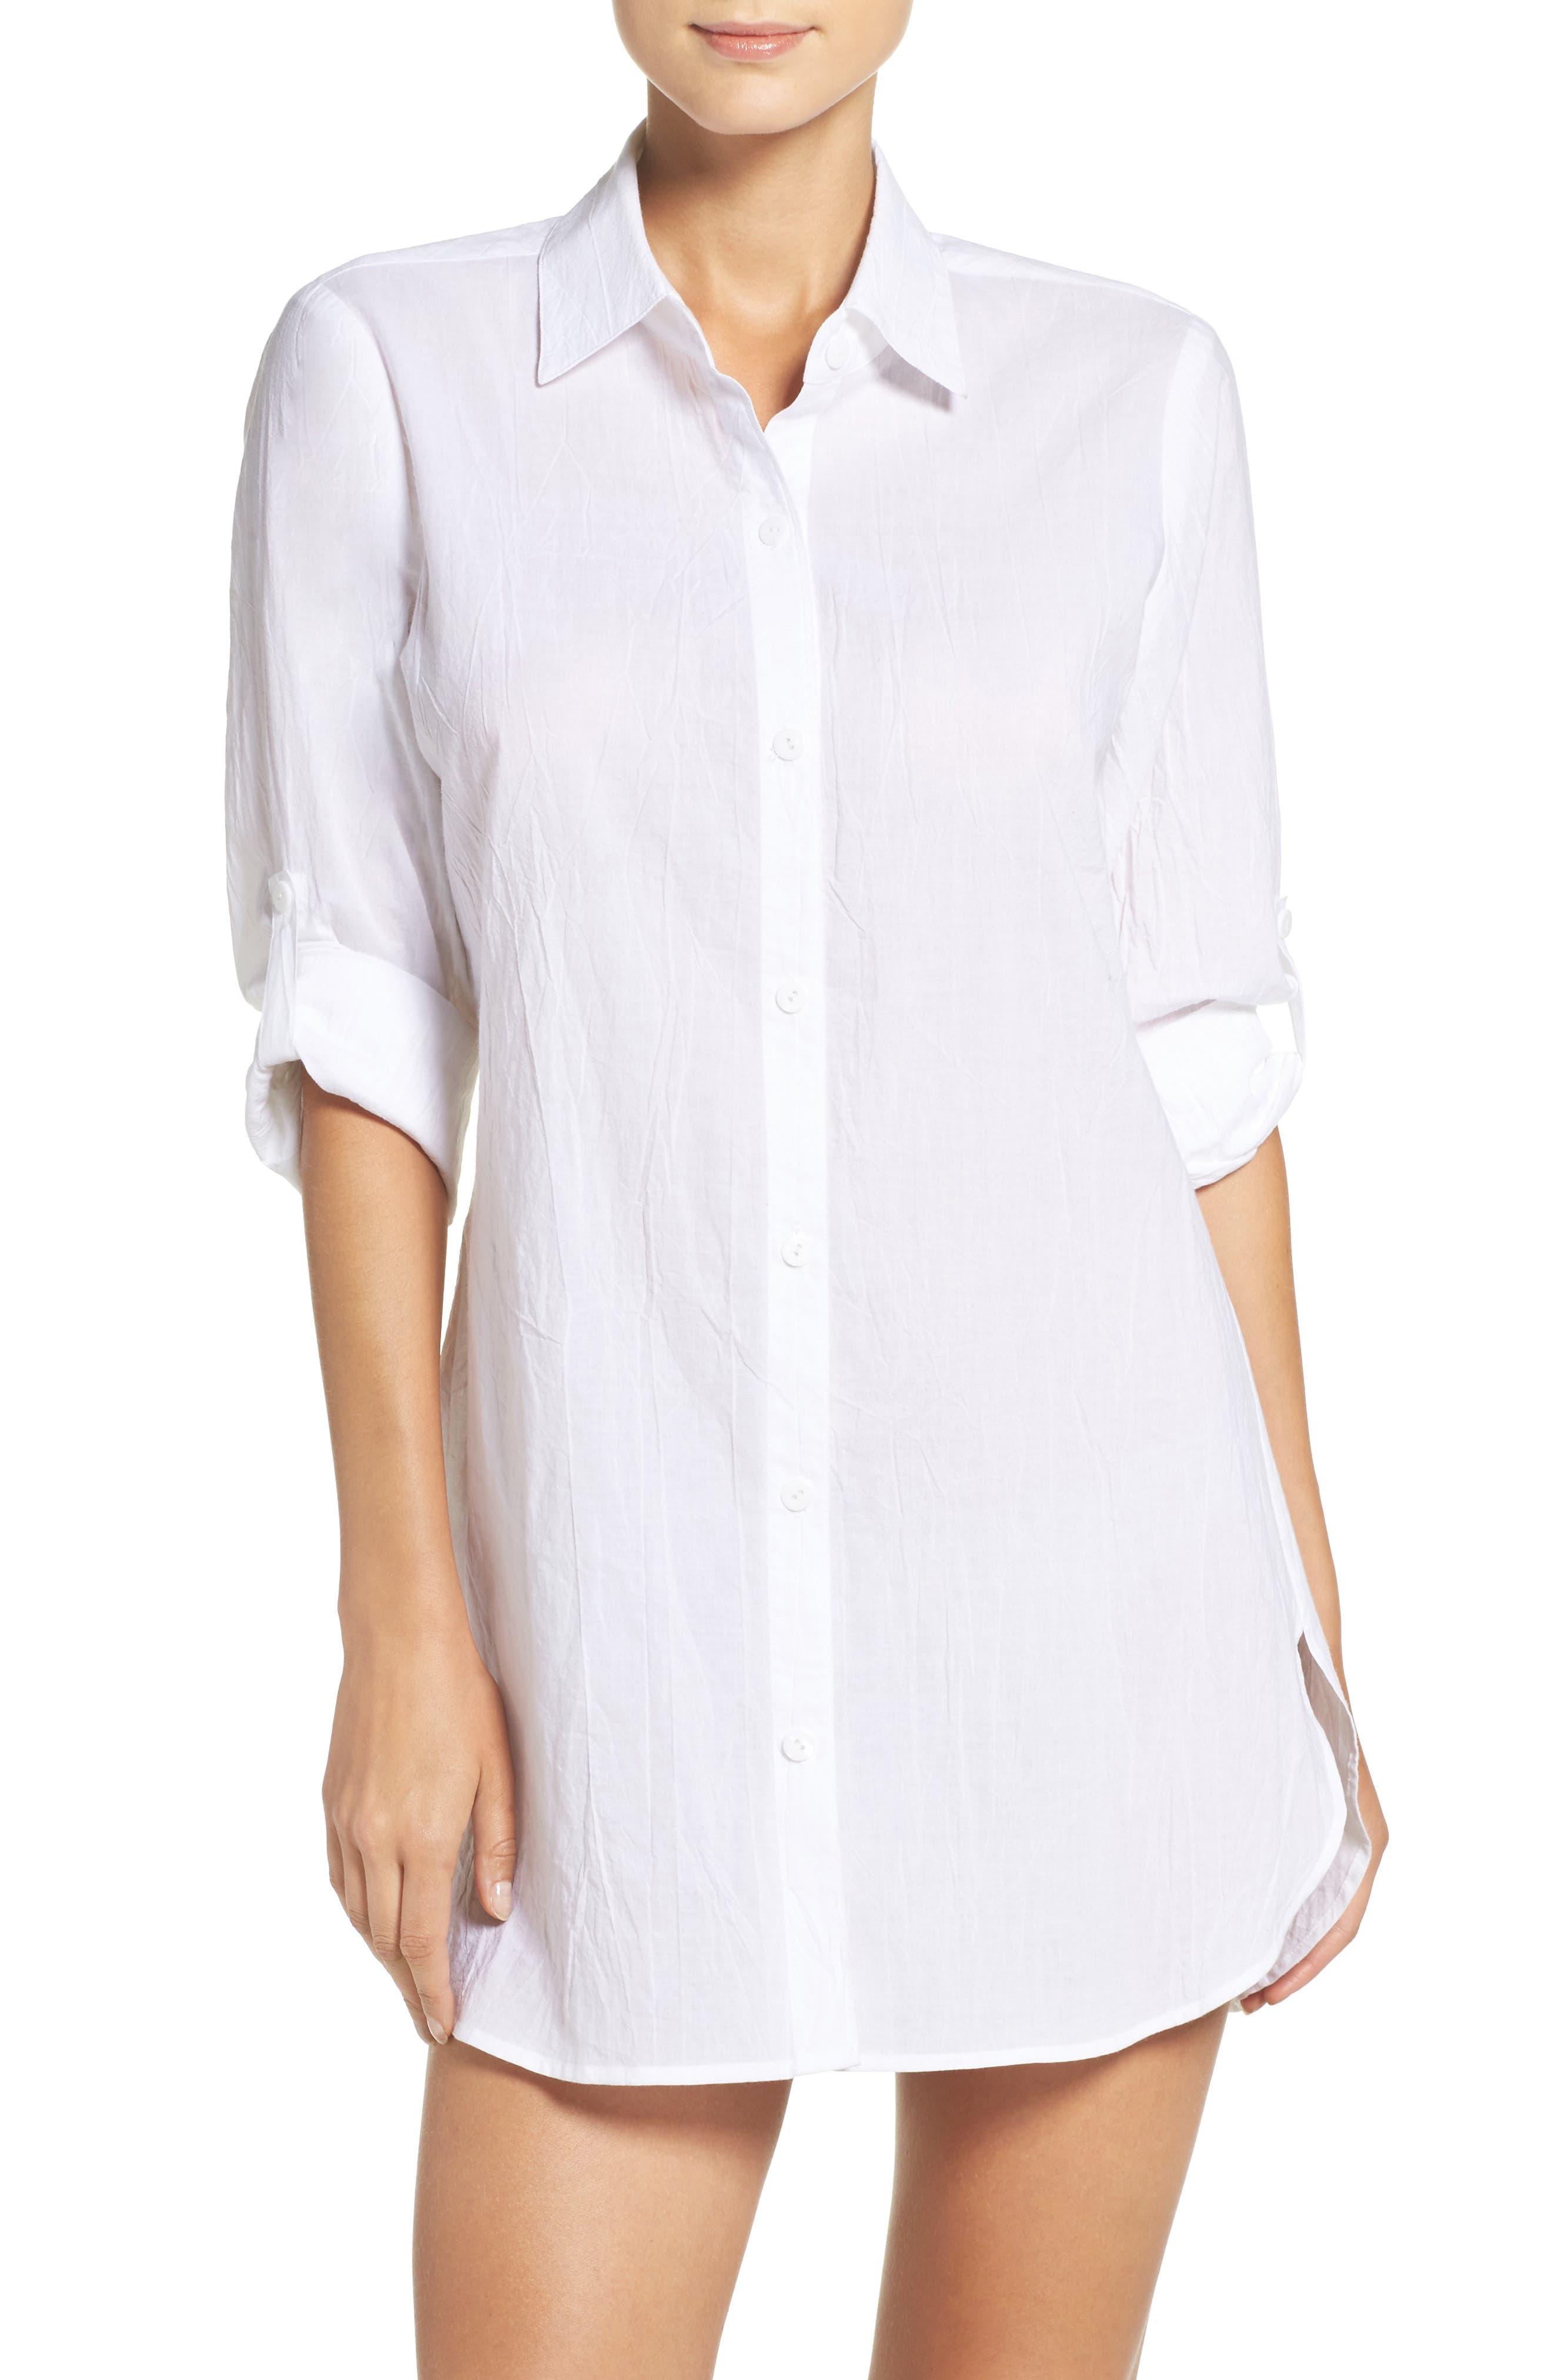 Boyfriend Shirt Cover-Up,                             Main thumbnail 1, color,                             White/ White